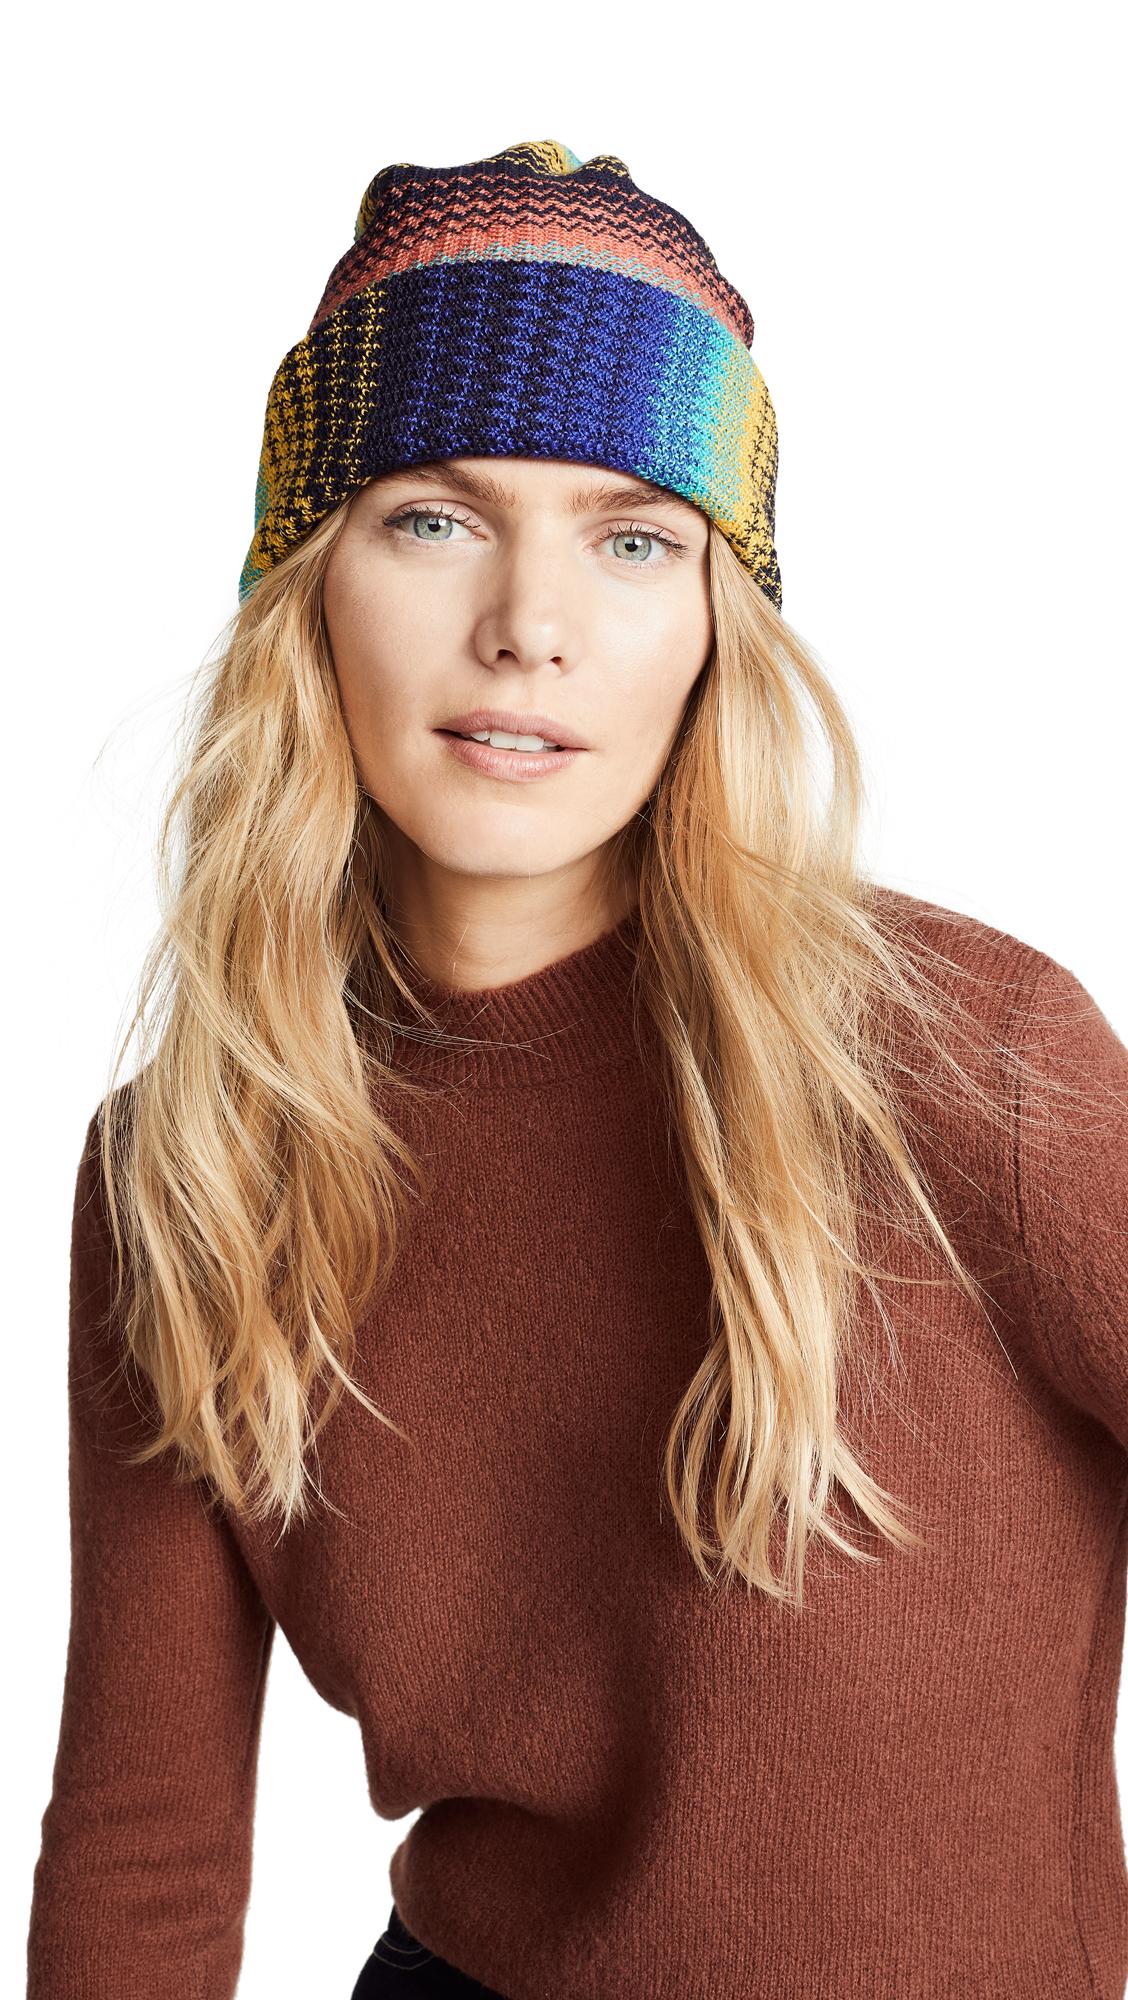 Missoni Striped Hat - Multi Blue/Yellow